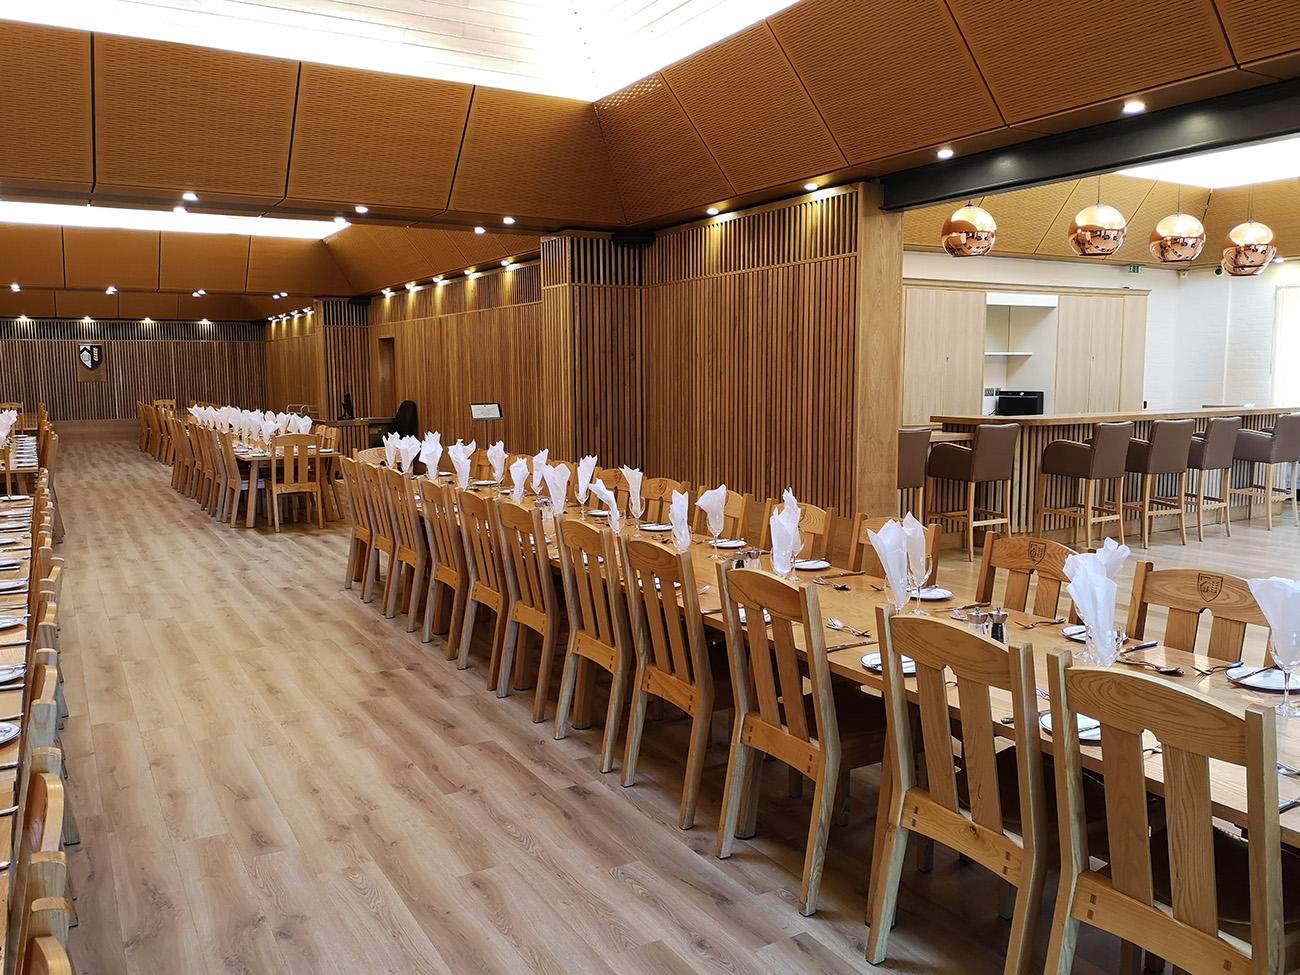 Dining Hall and bar